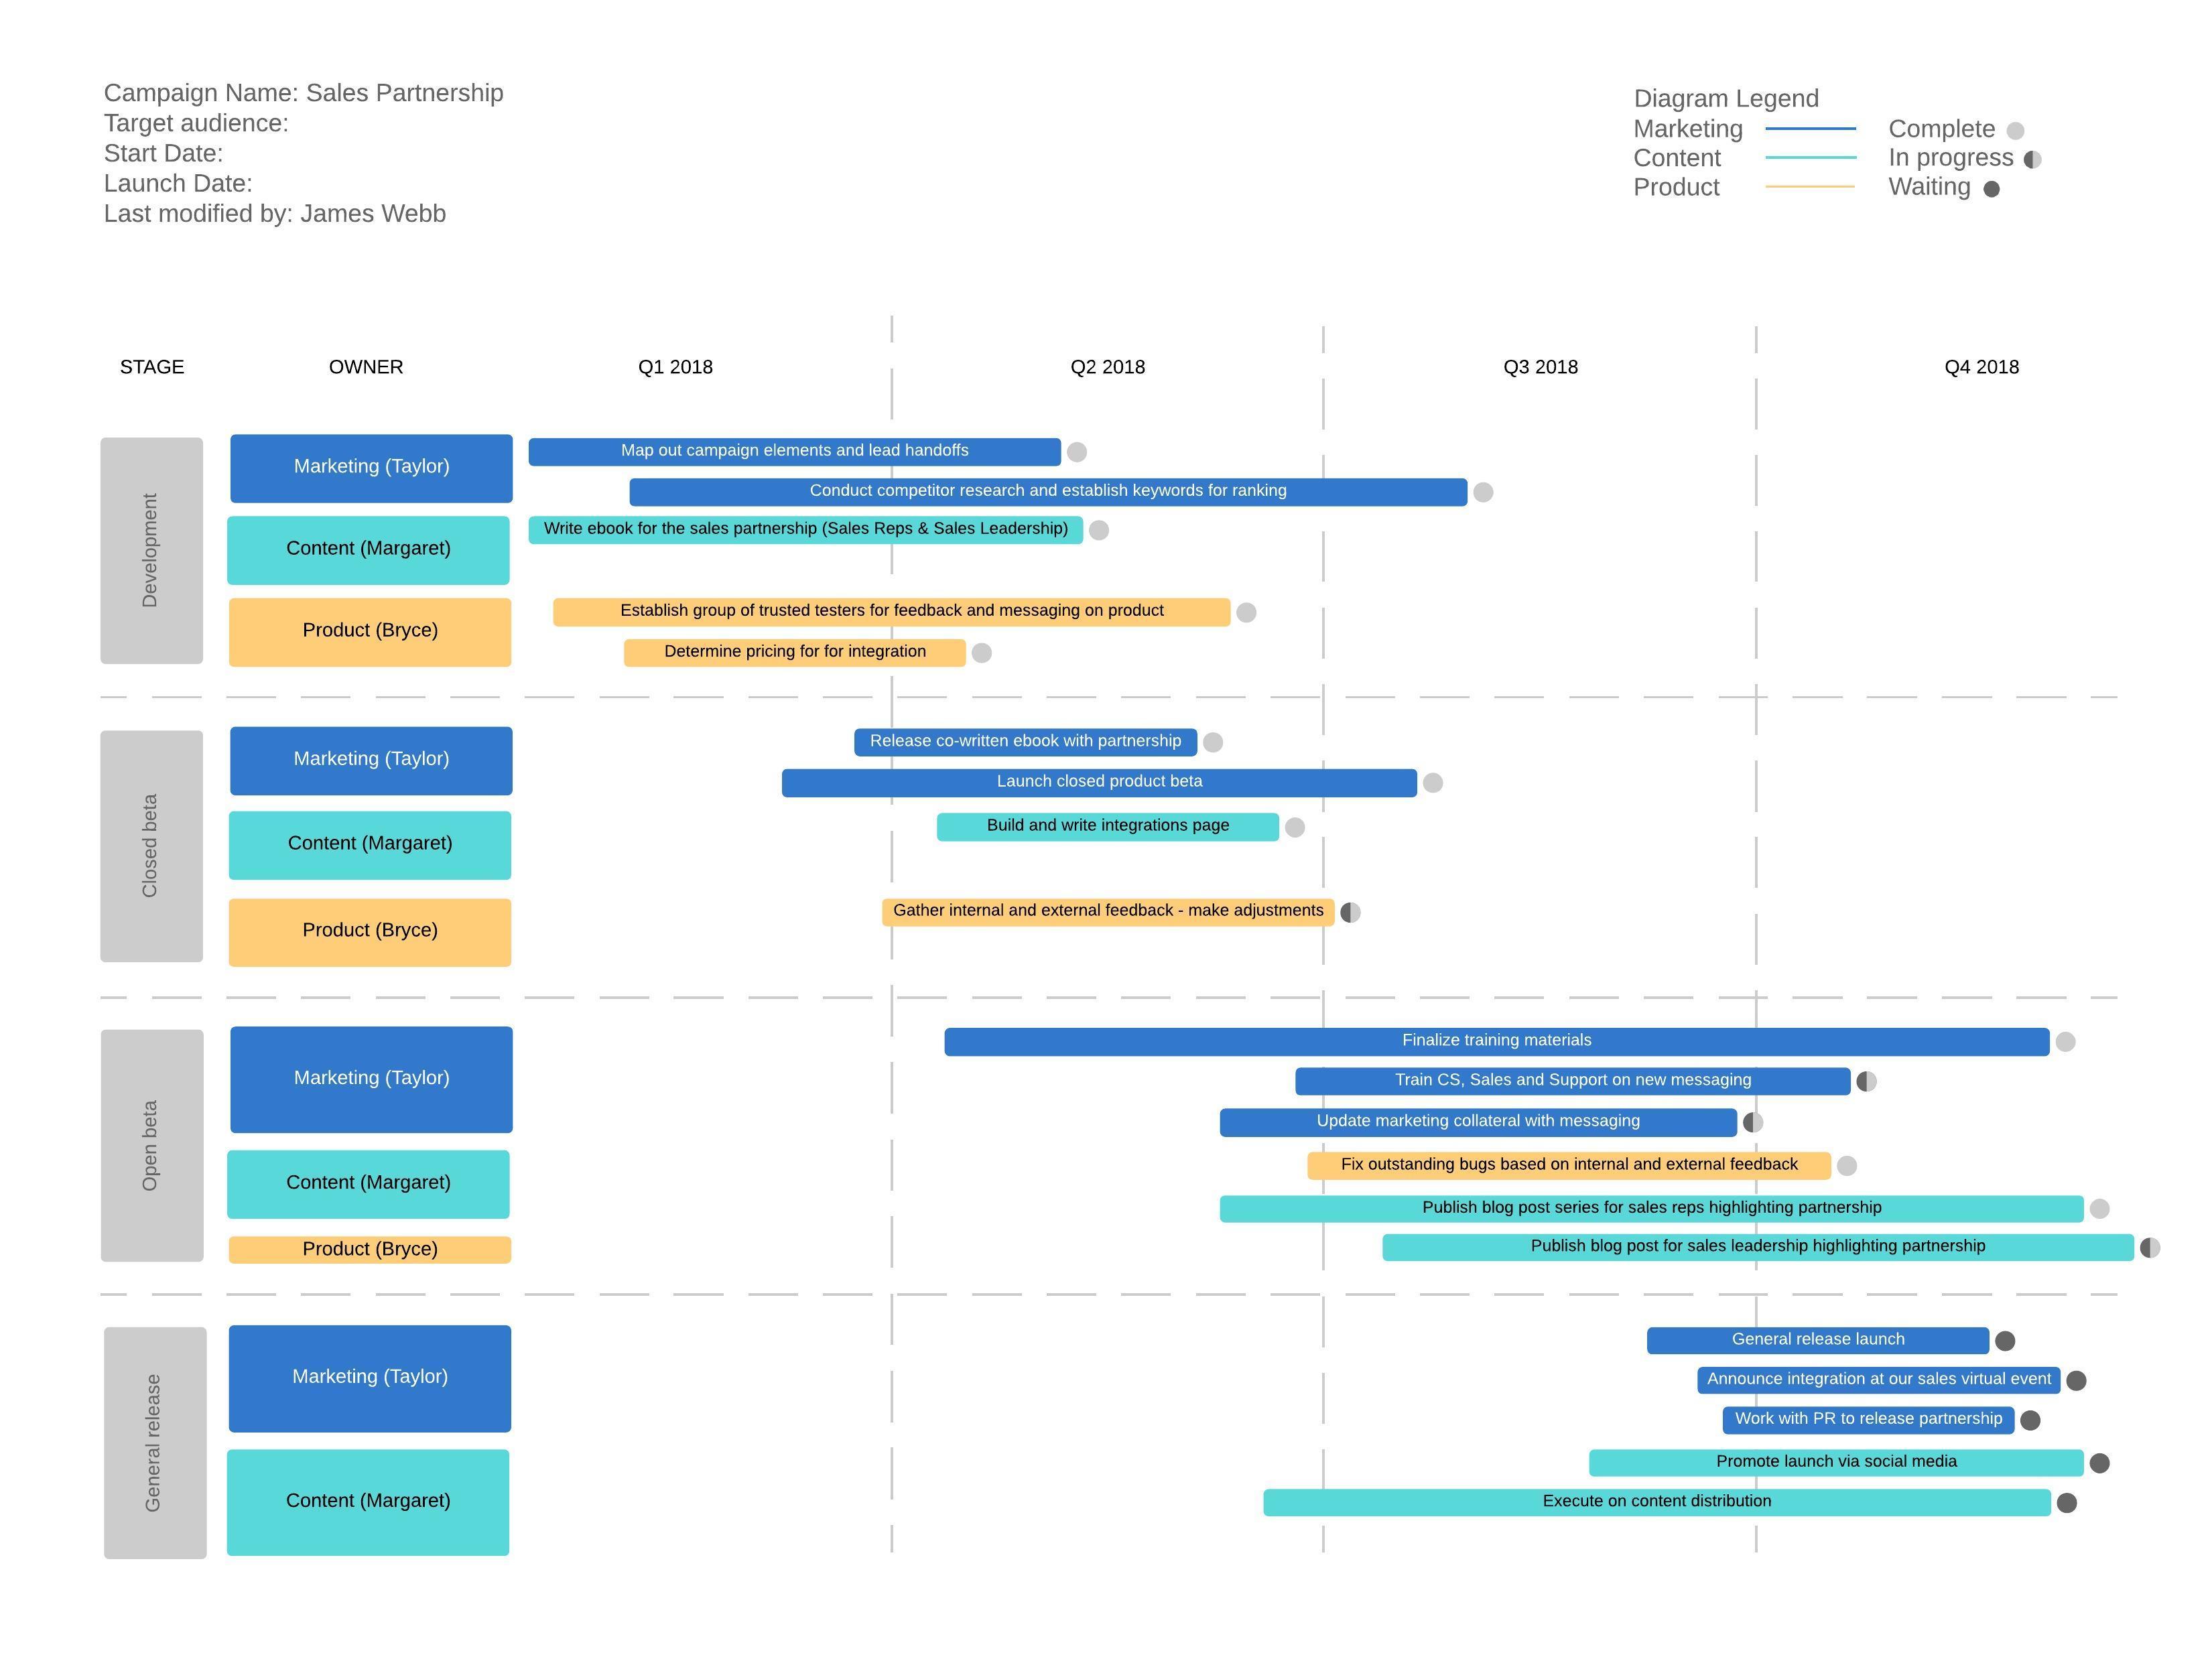 Diagrama de Gantt de salida al mercado